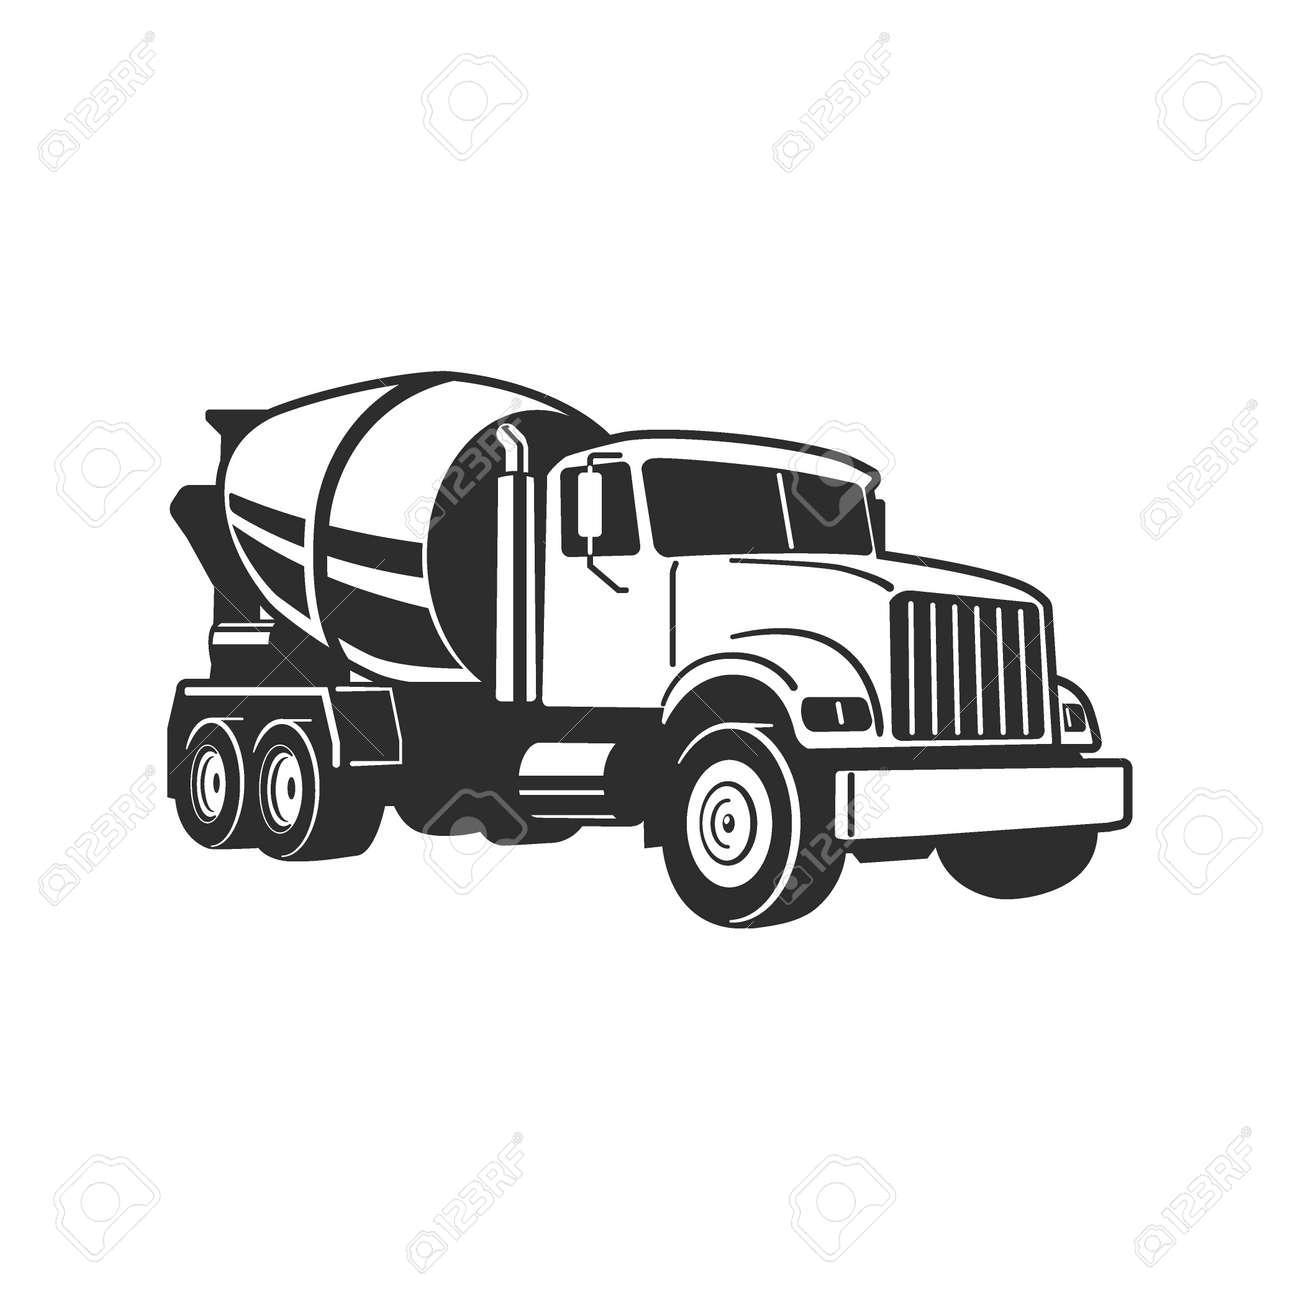 Concrete Mixer Truck. Vector Illustration. Concrete Mixer Truck. Vector Illustration. Concrete Mixer Truck. Vector Illustration - 171160526